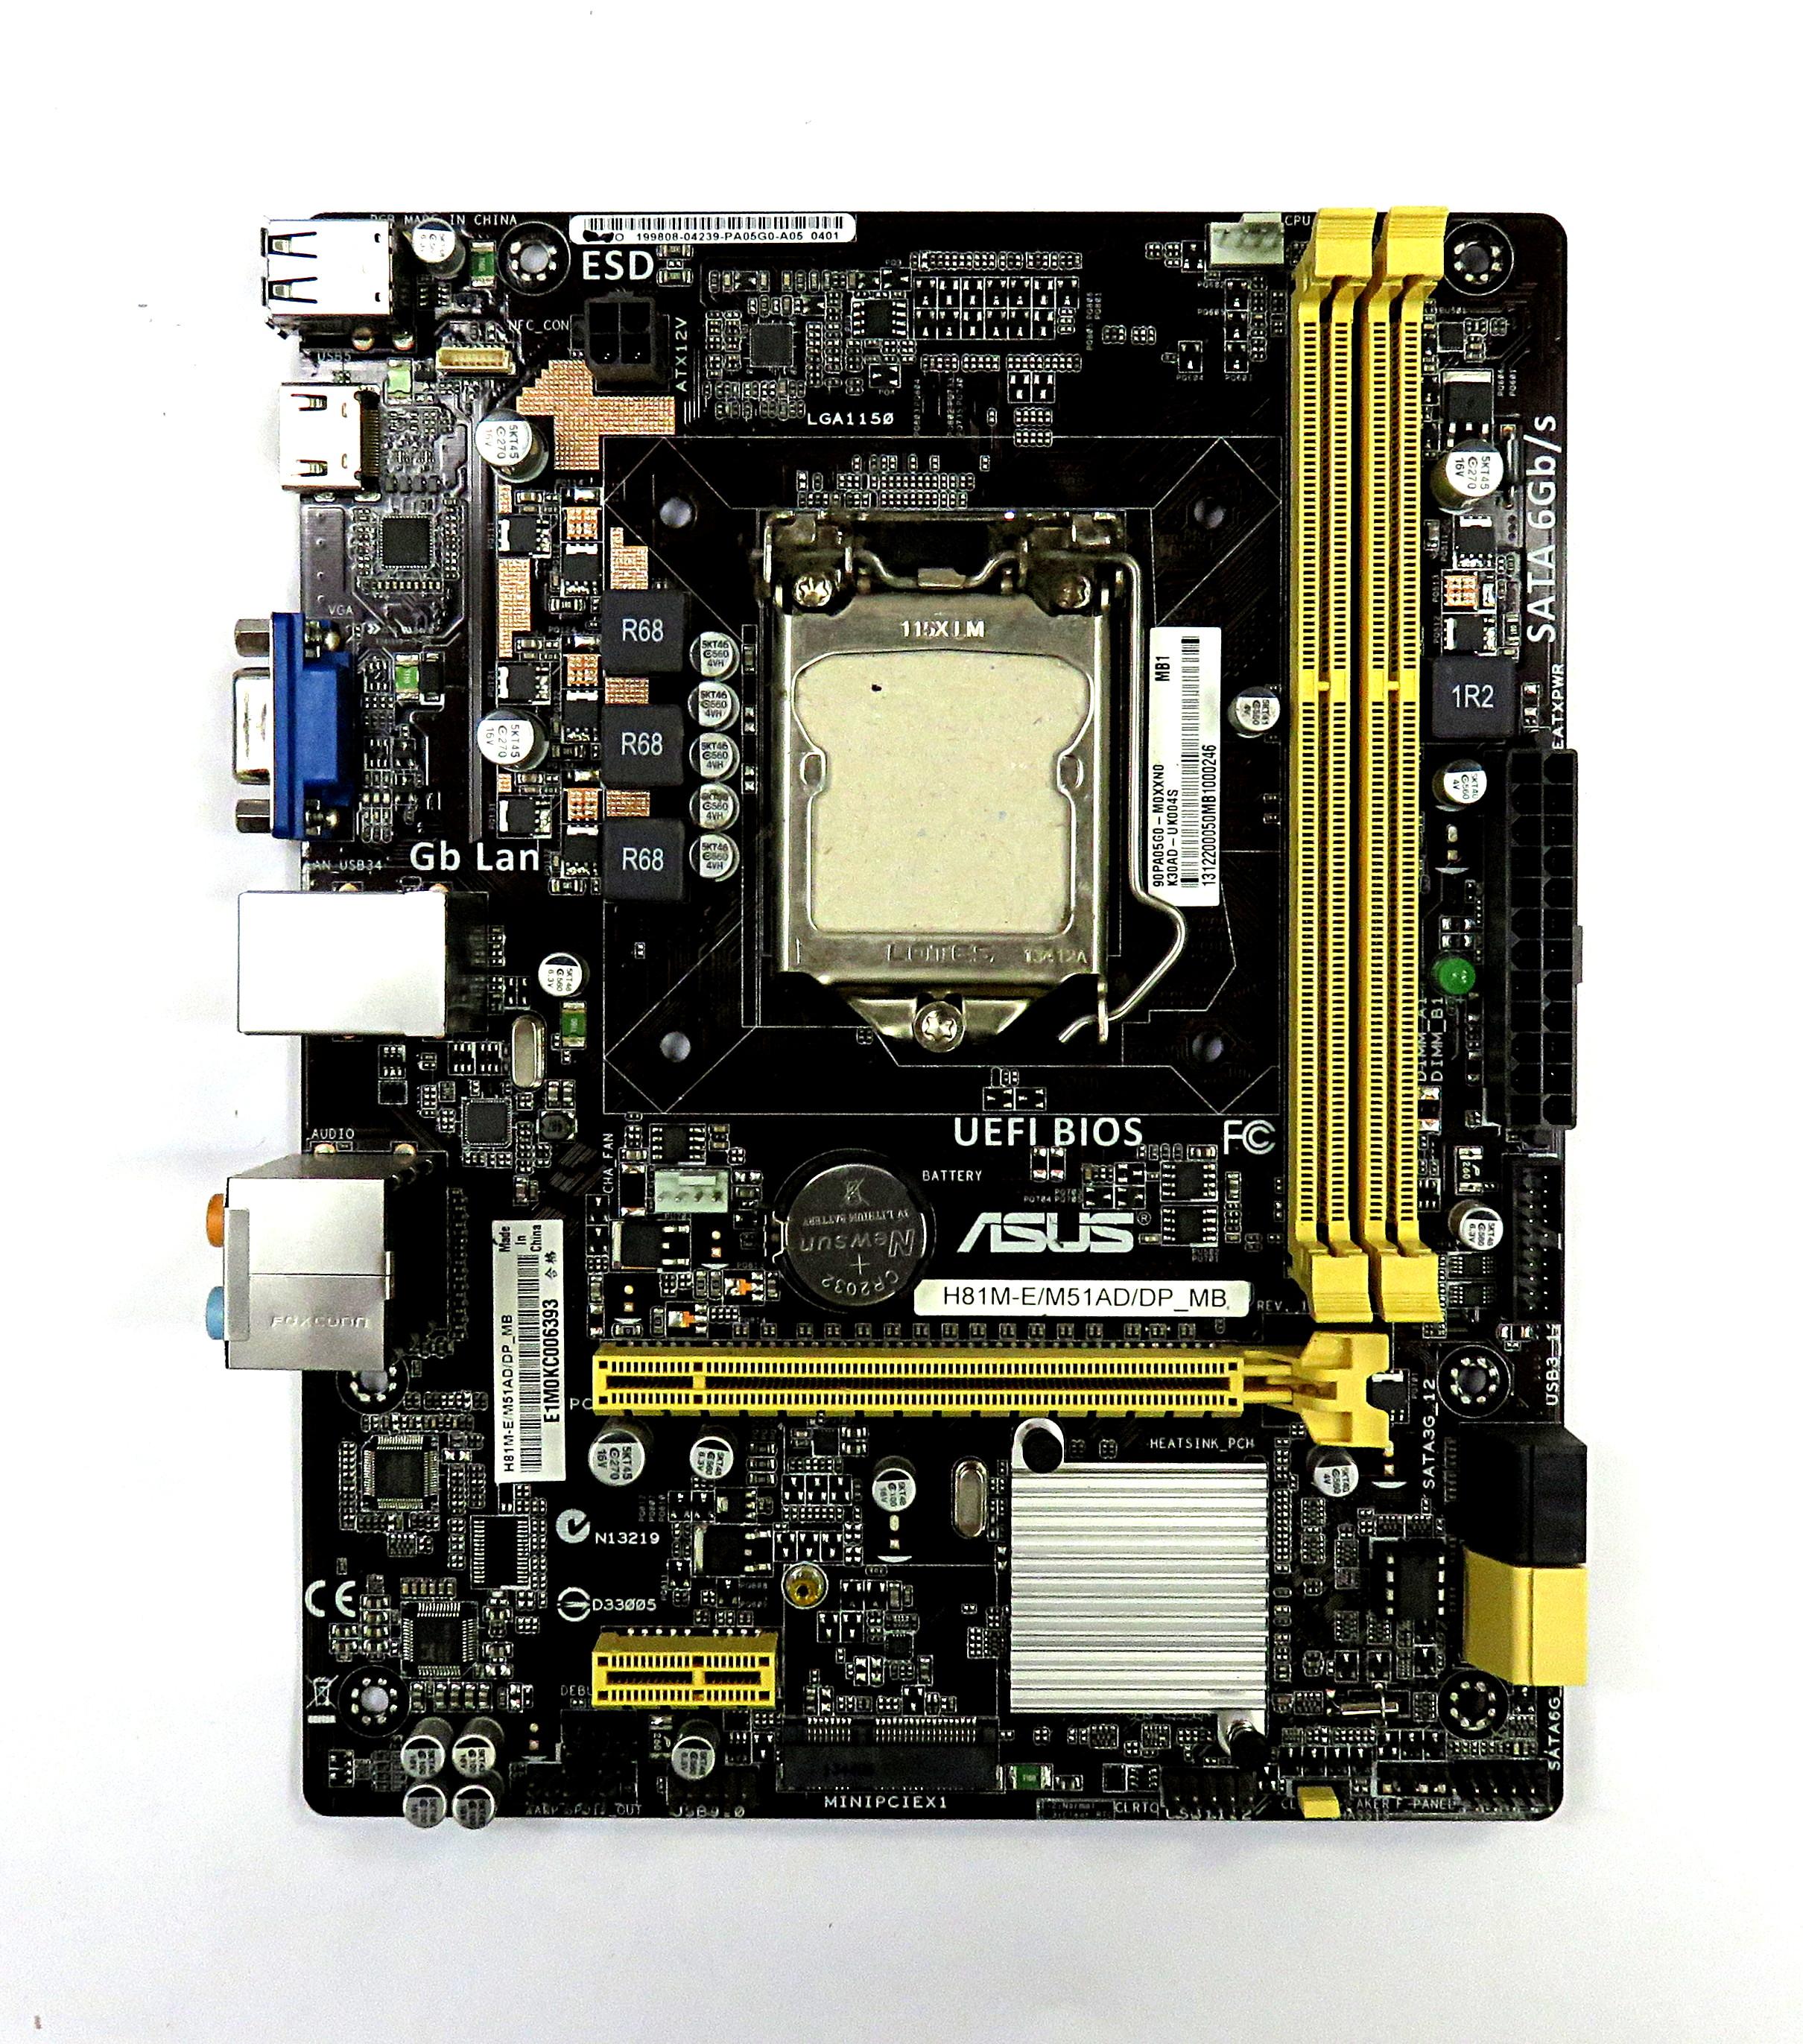 Asus H81M E M51AD DP MB Intel Socket LGA1150 UATX